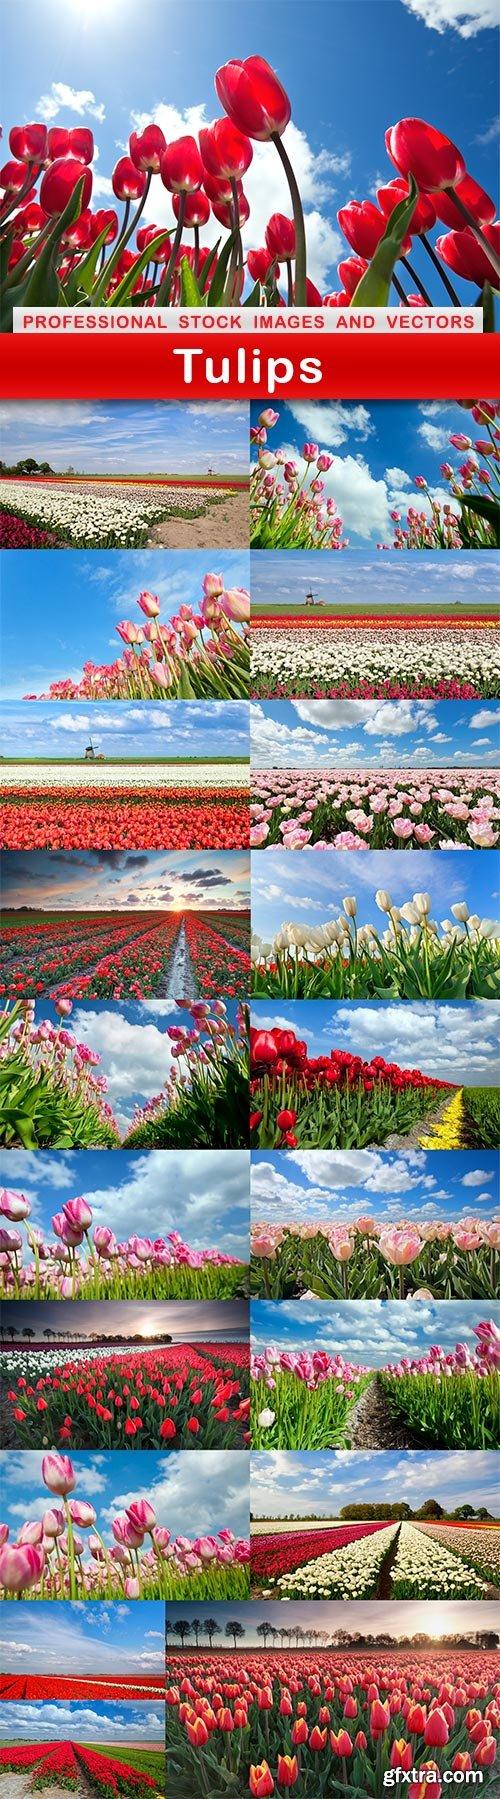 Tulips - 20 UHQ JPEG